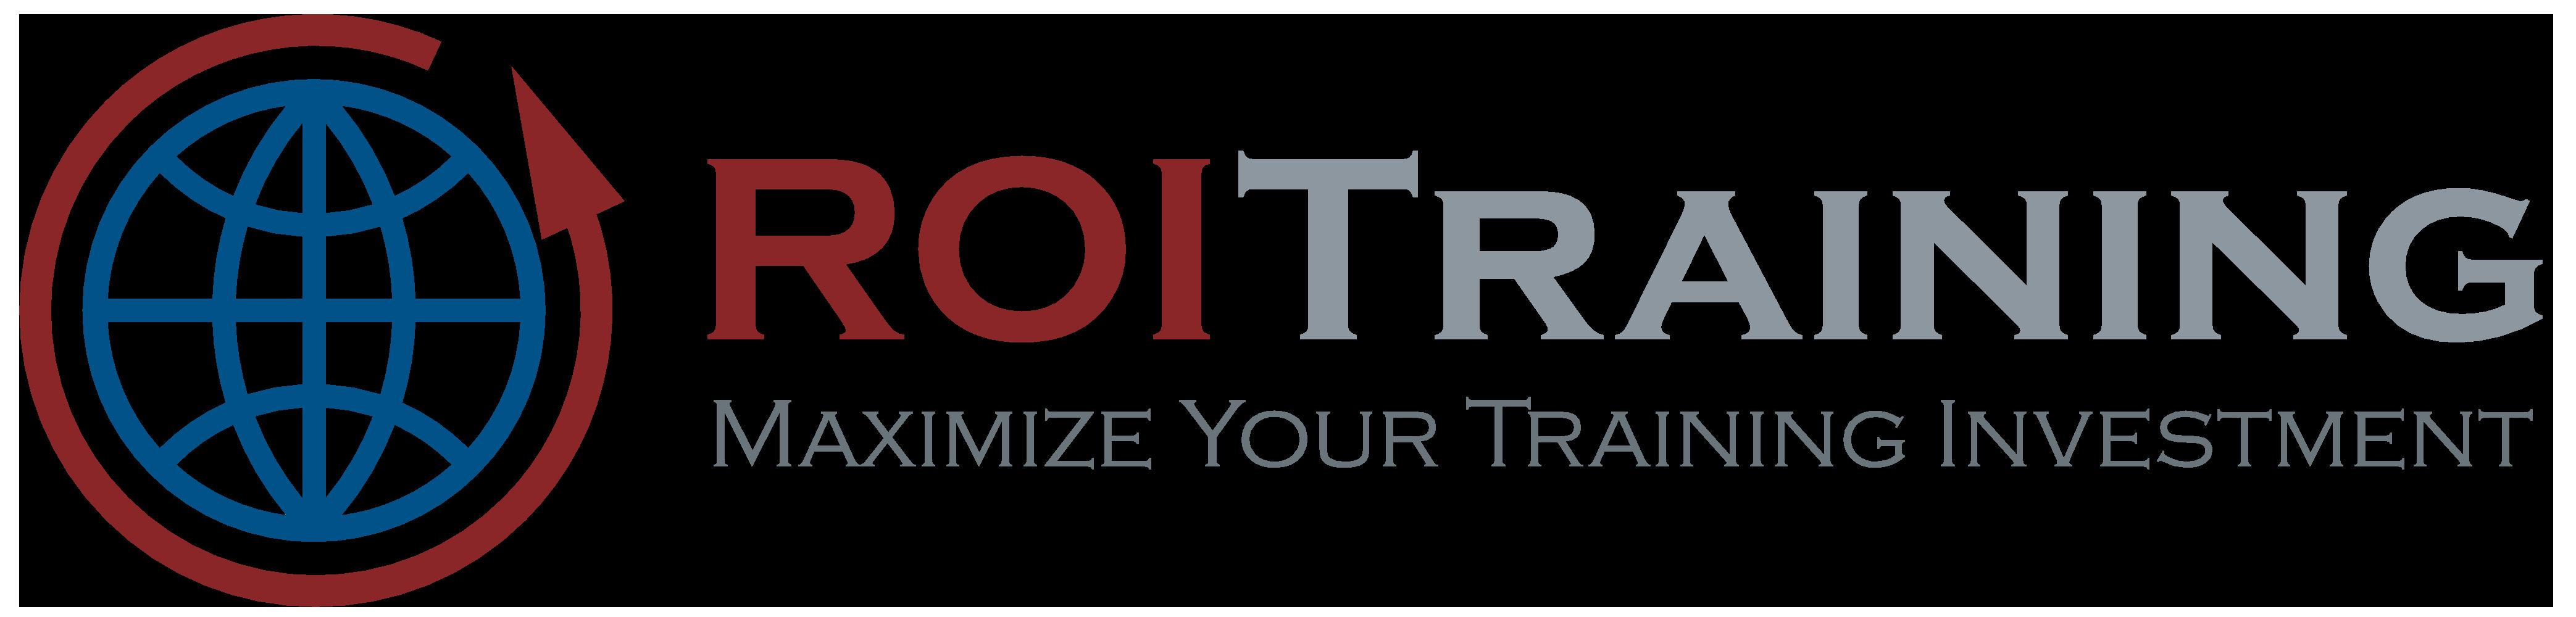 roi training maximize your training investment